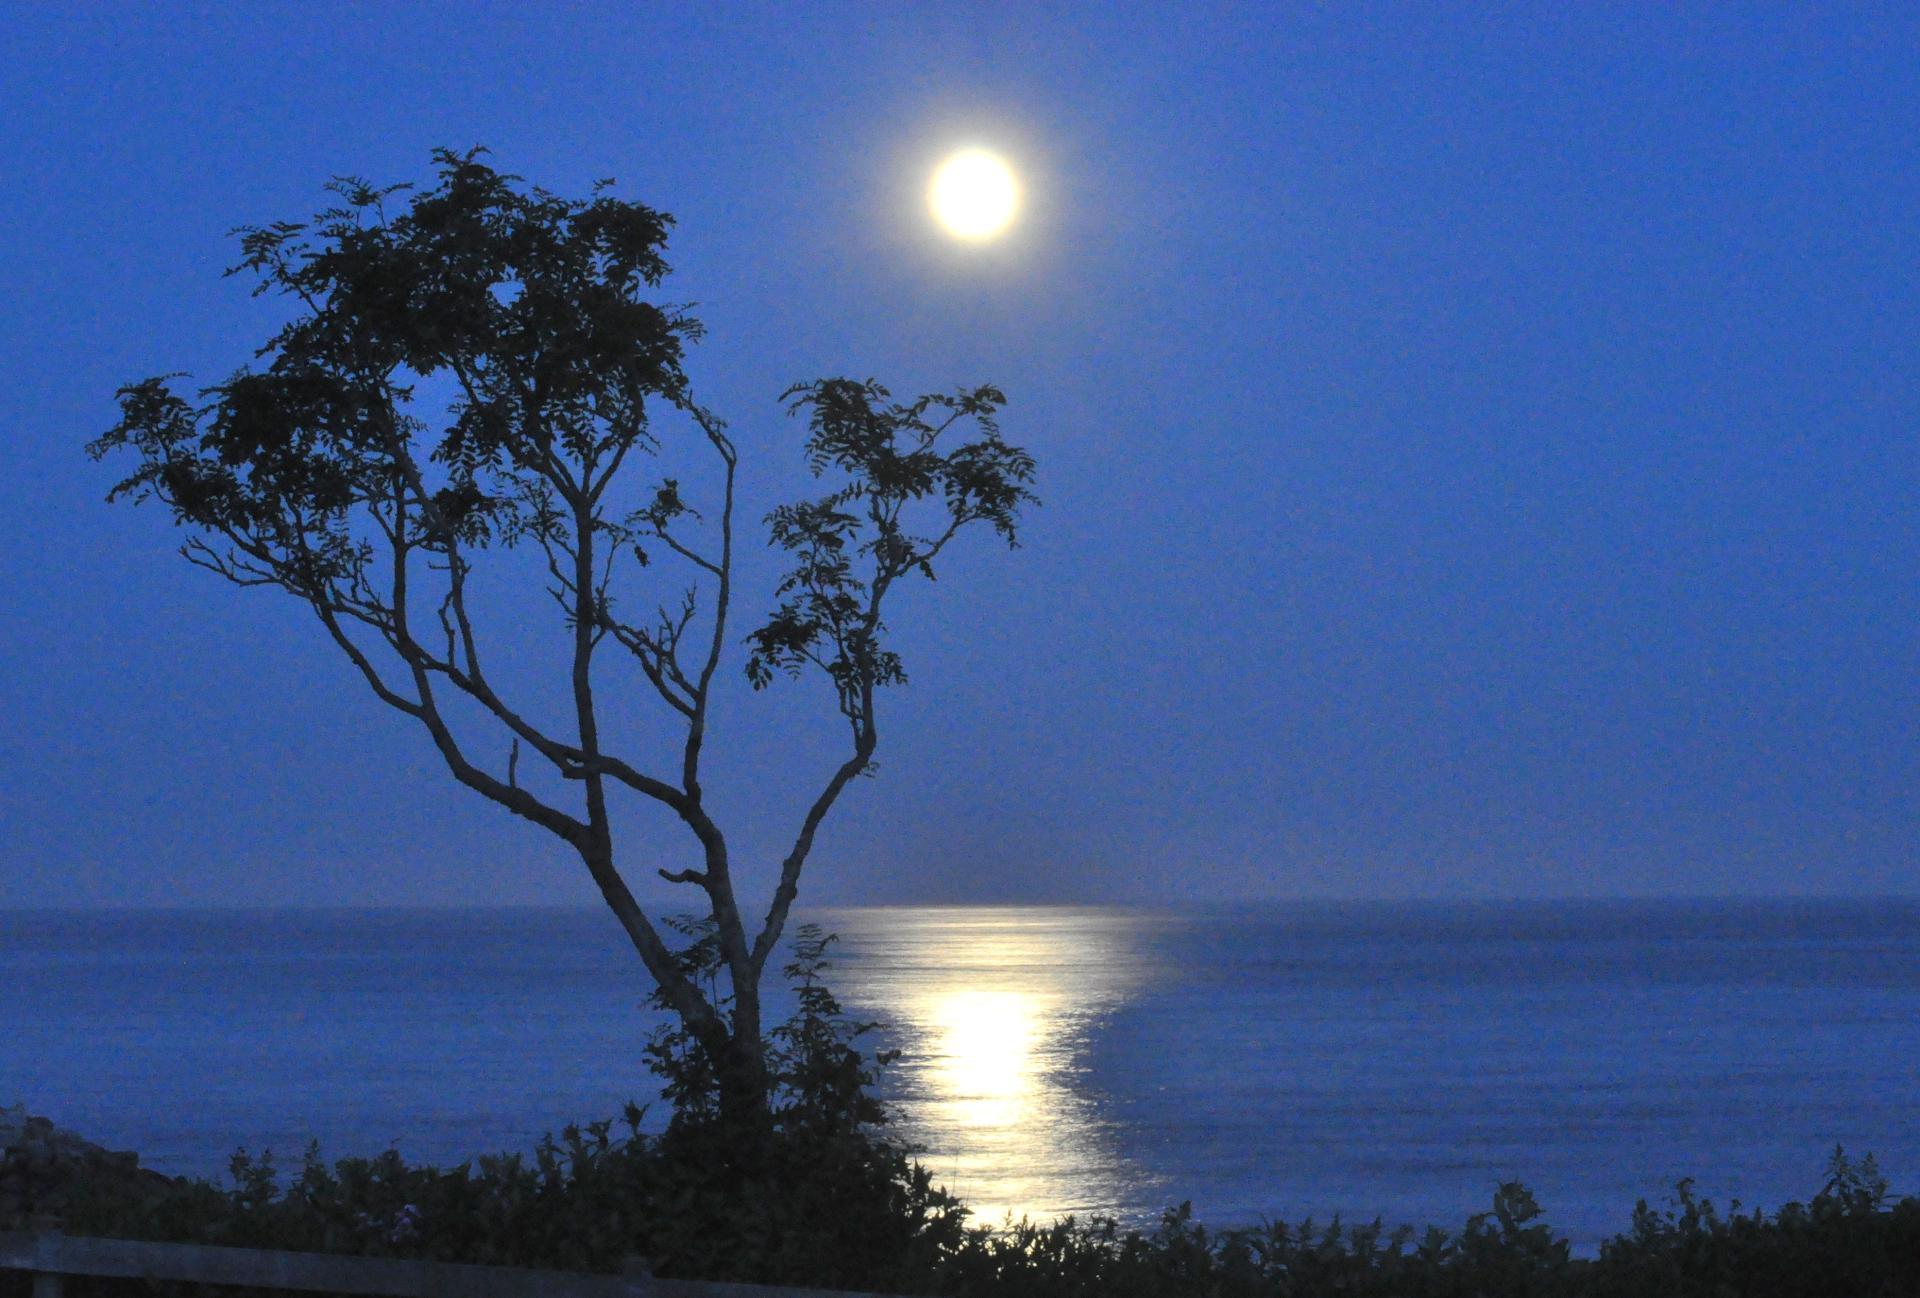 Moon in tree by shore